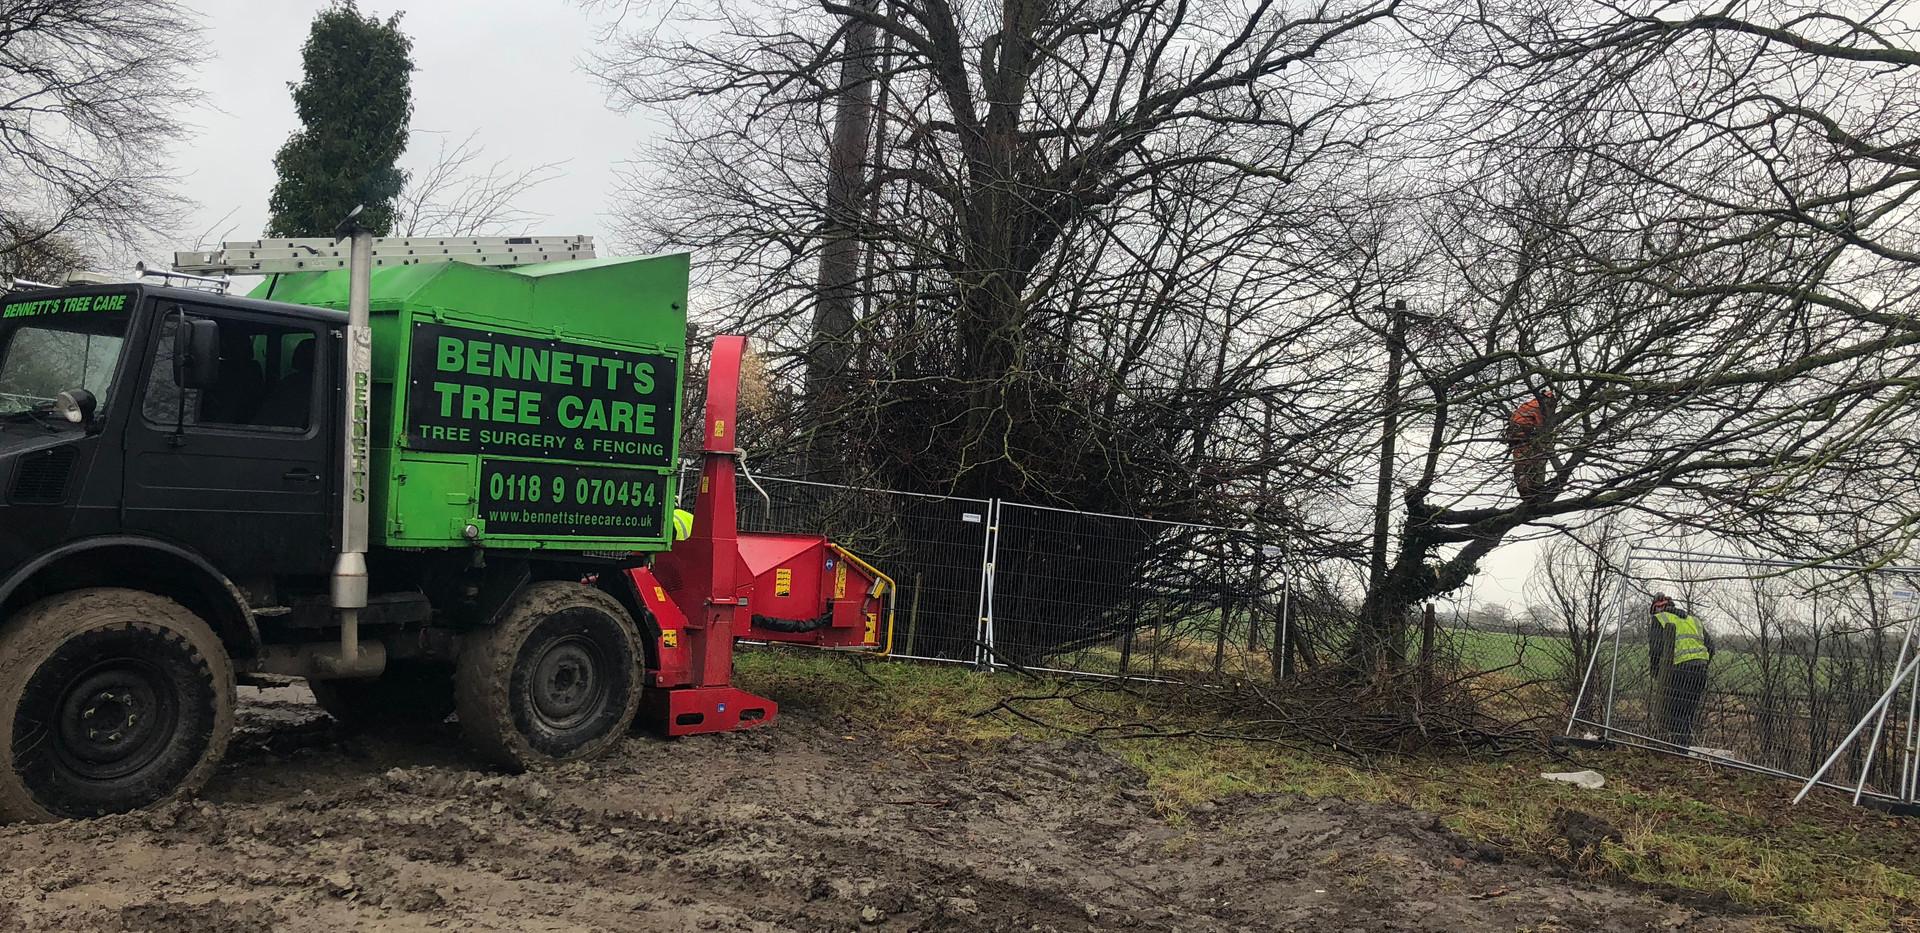 Bennetts Tree Care  unimog